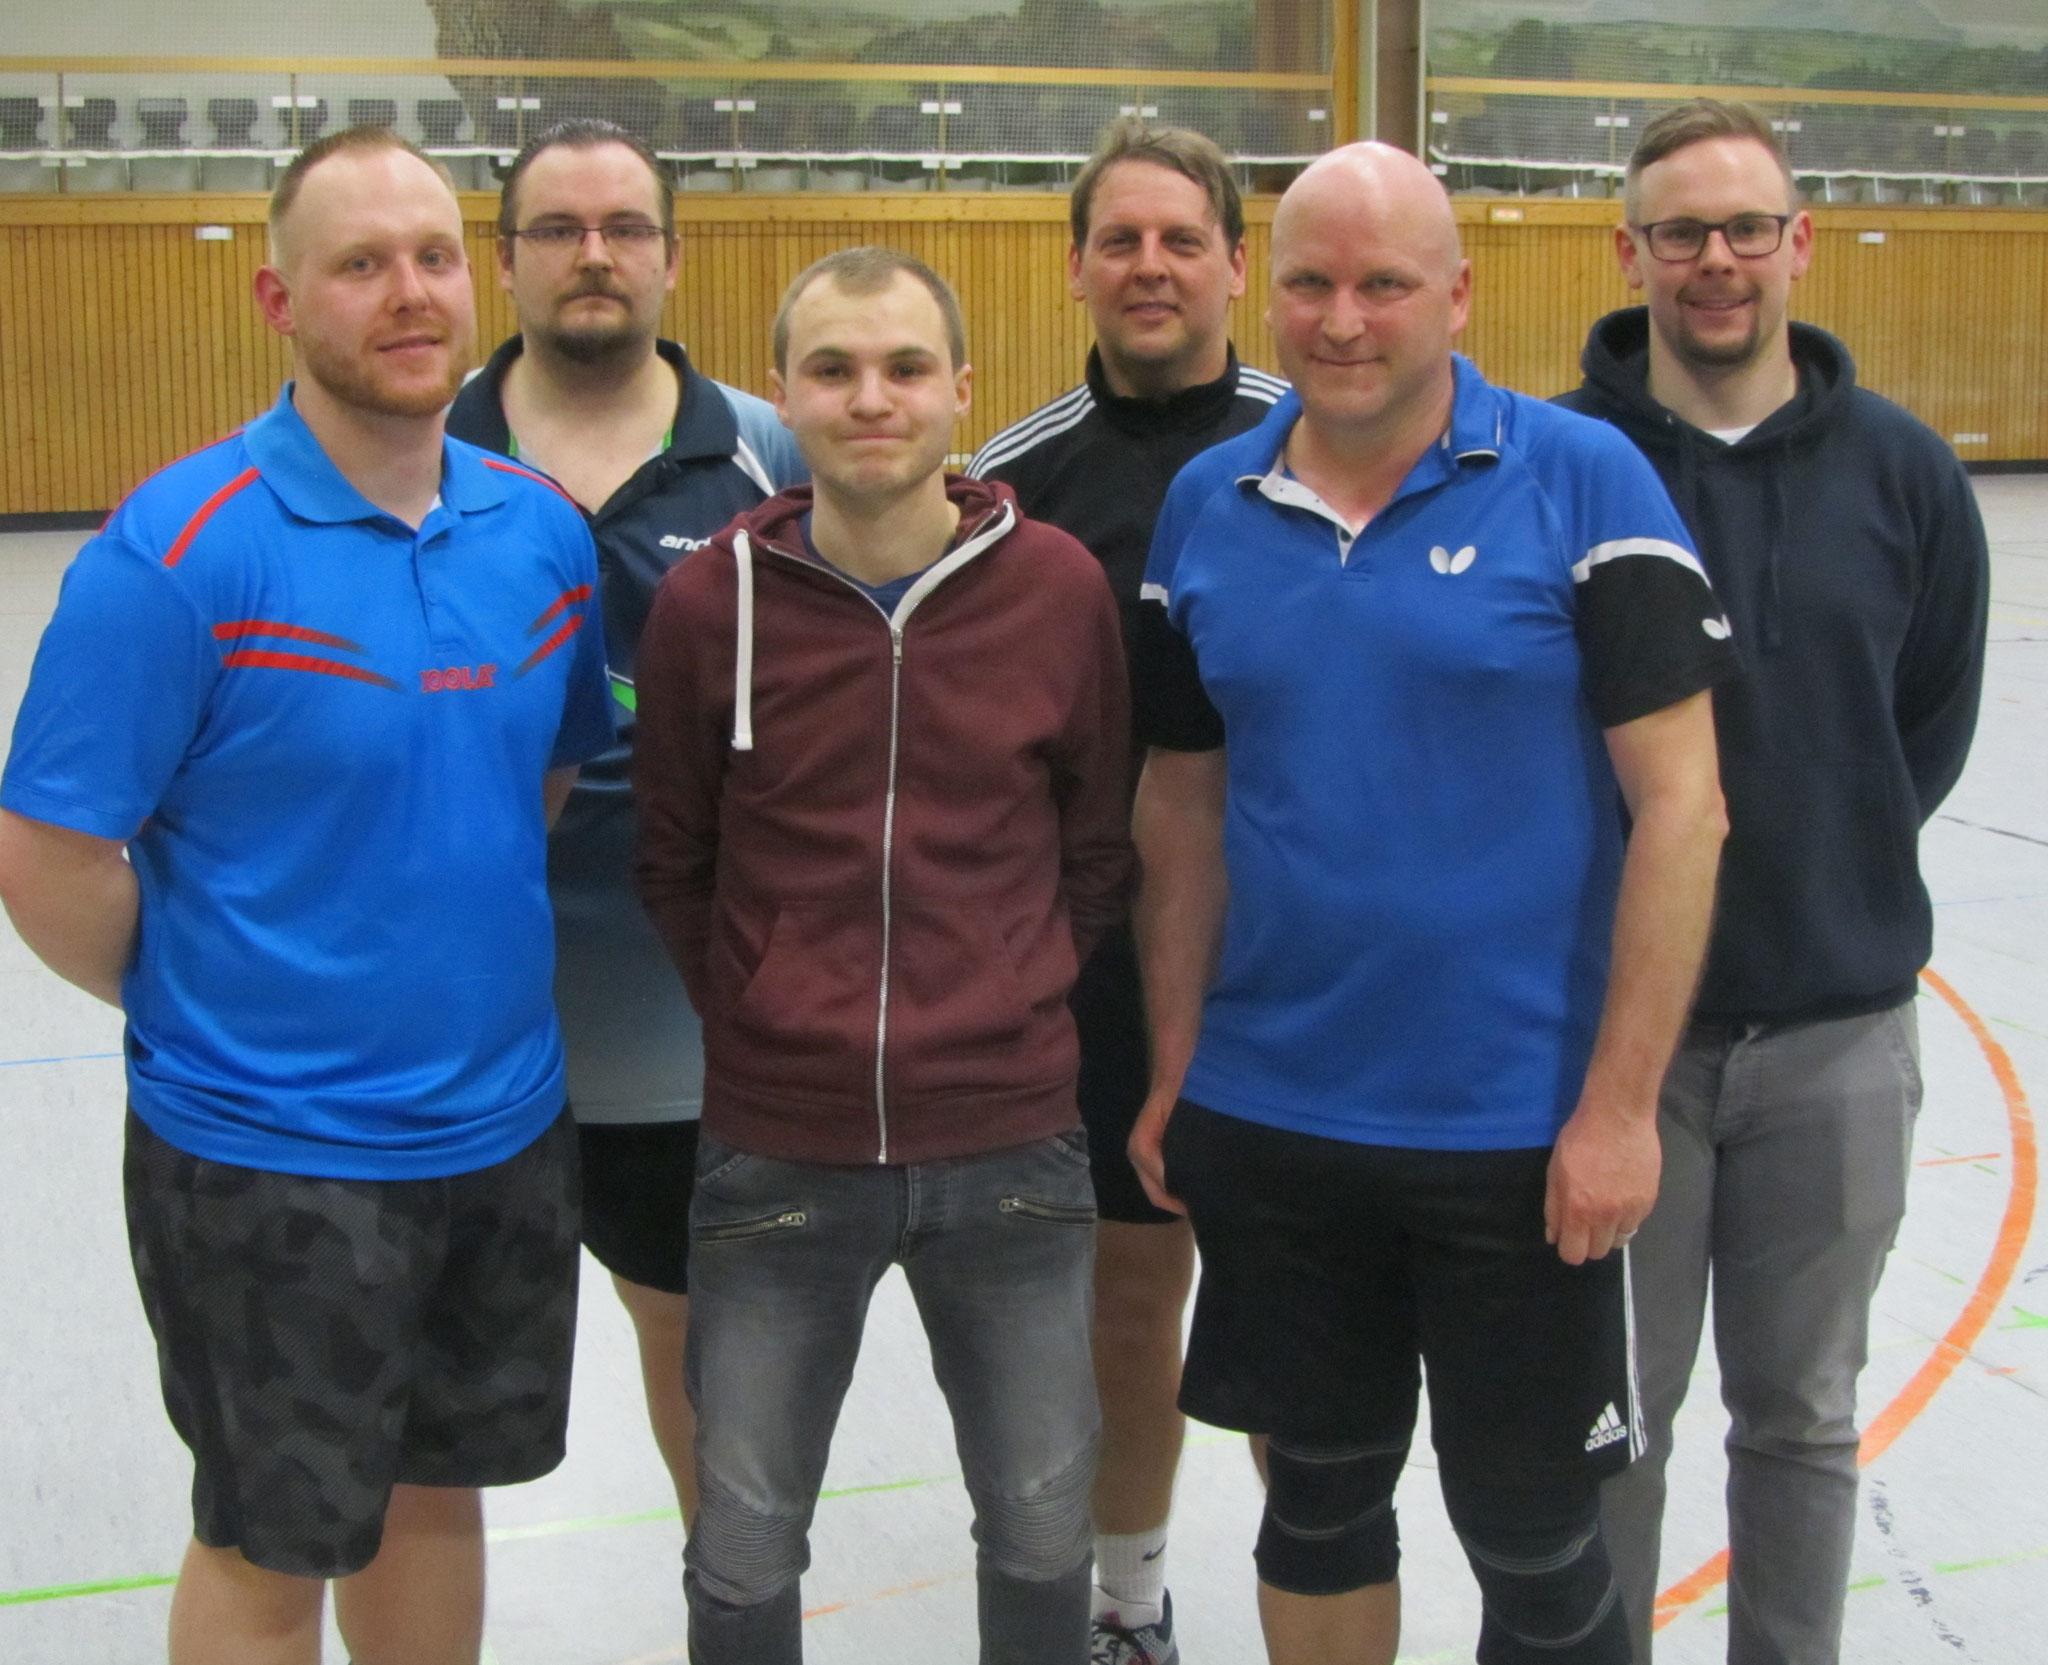 v.l. Daniel Schmitz, Tobias Schuller, Edi Zizler, Klaus Balda, Patrick Schrepf und Benjamin Korbel